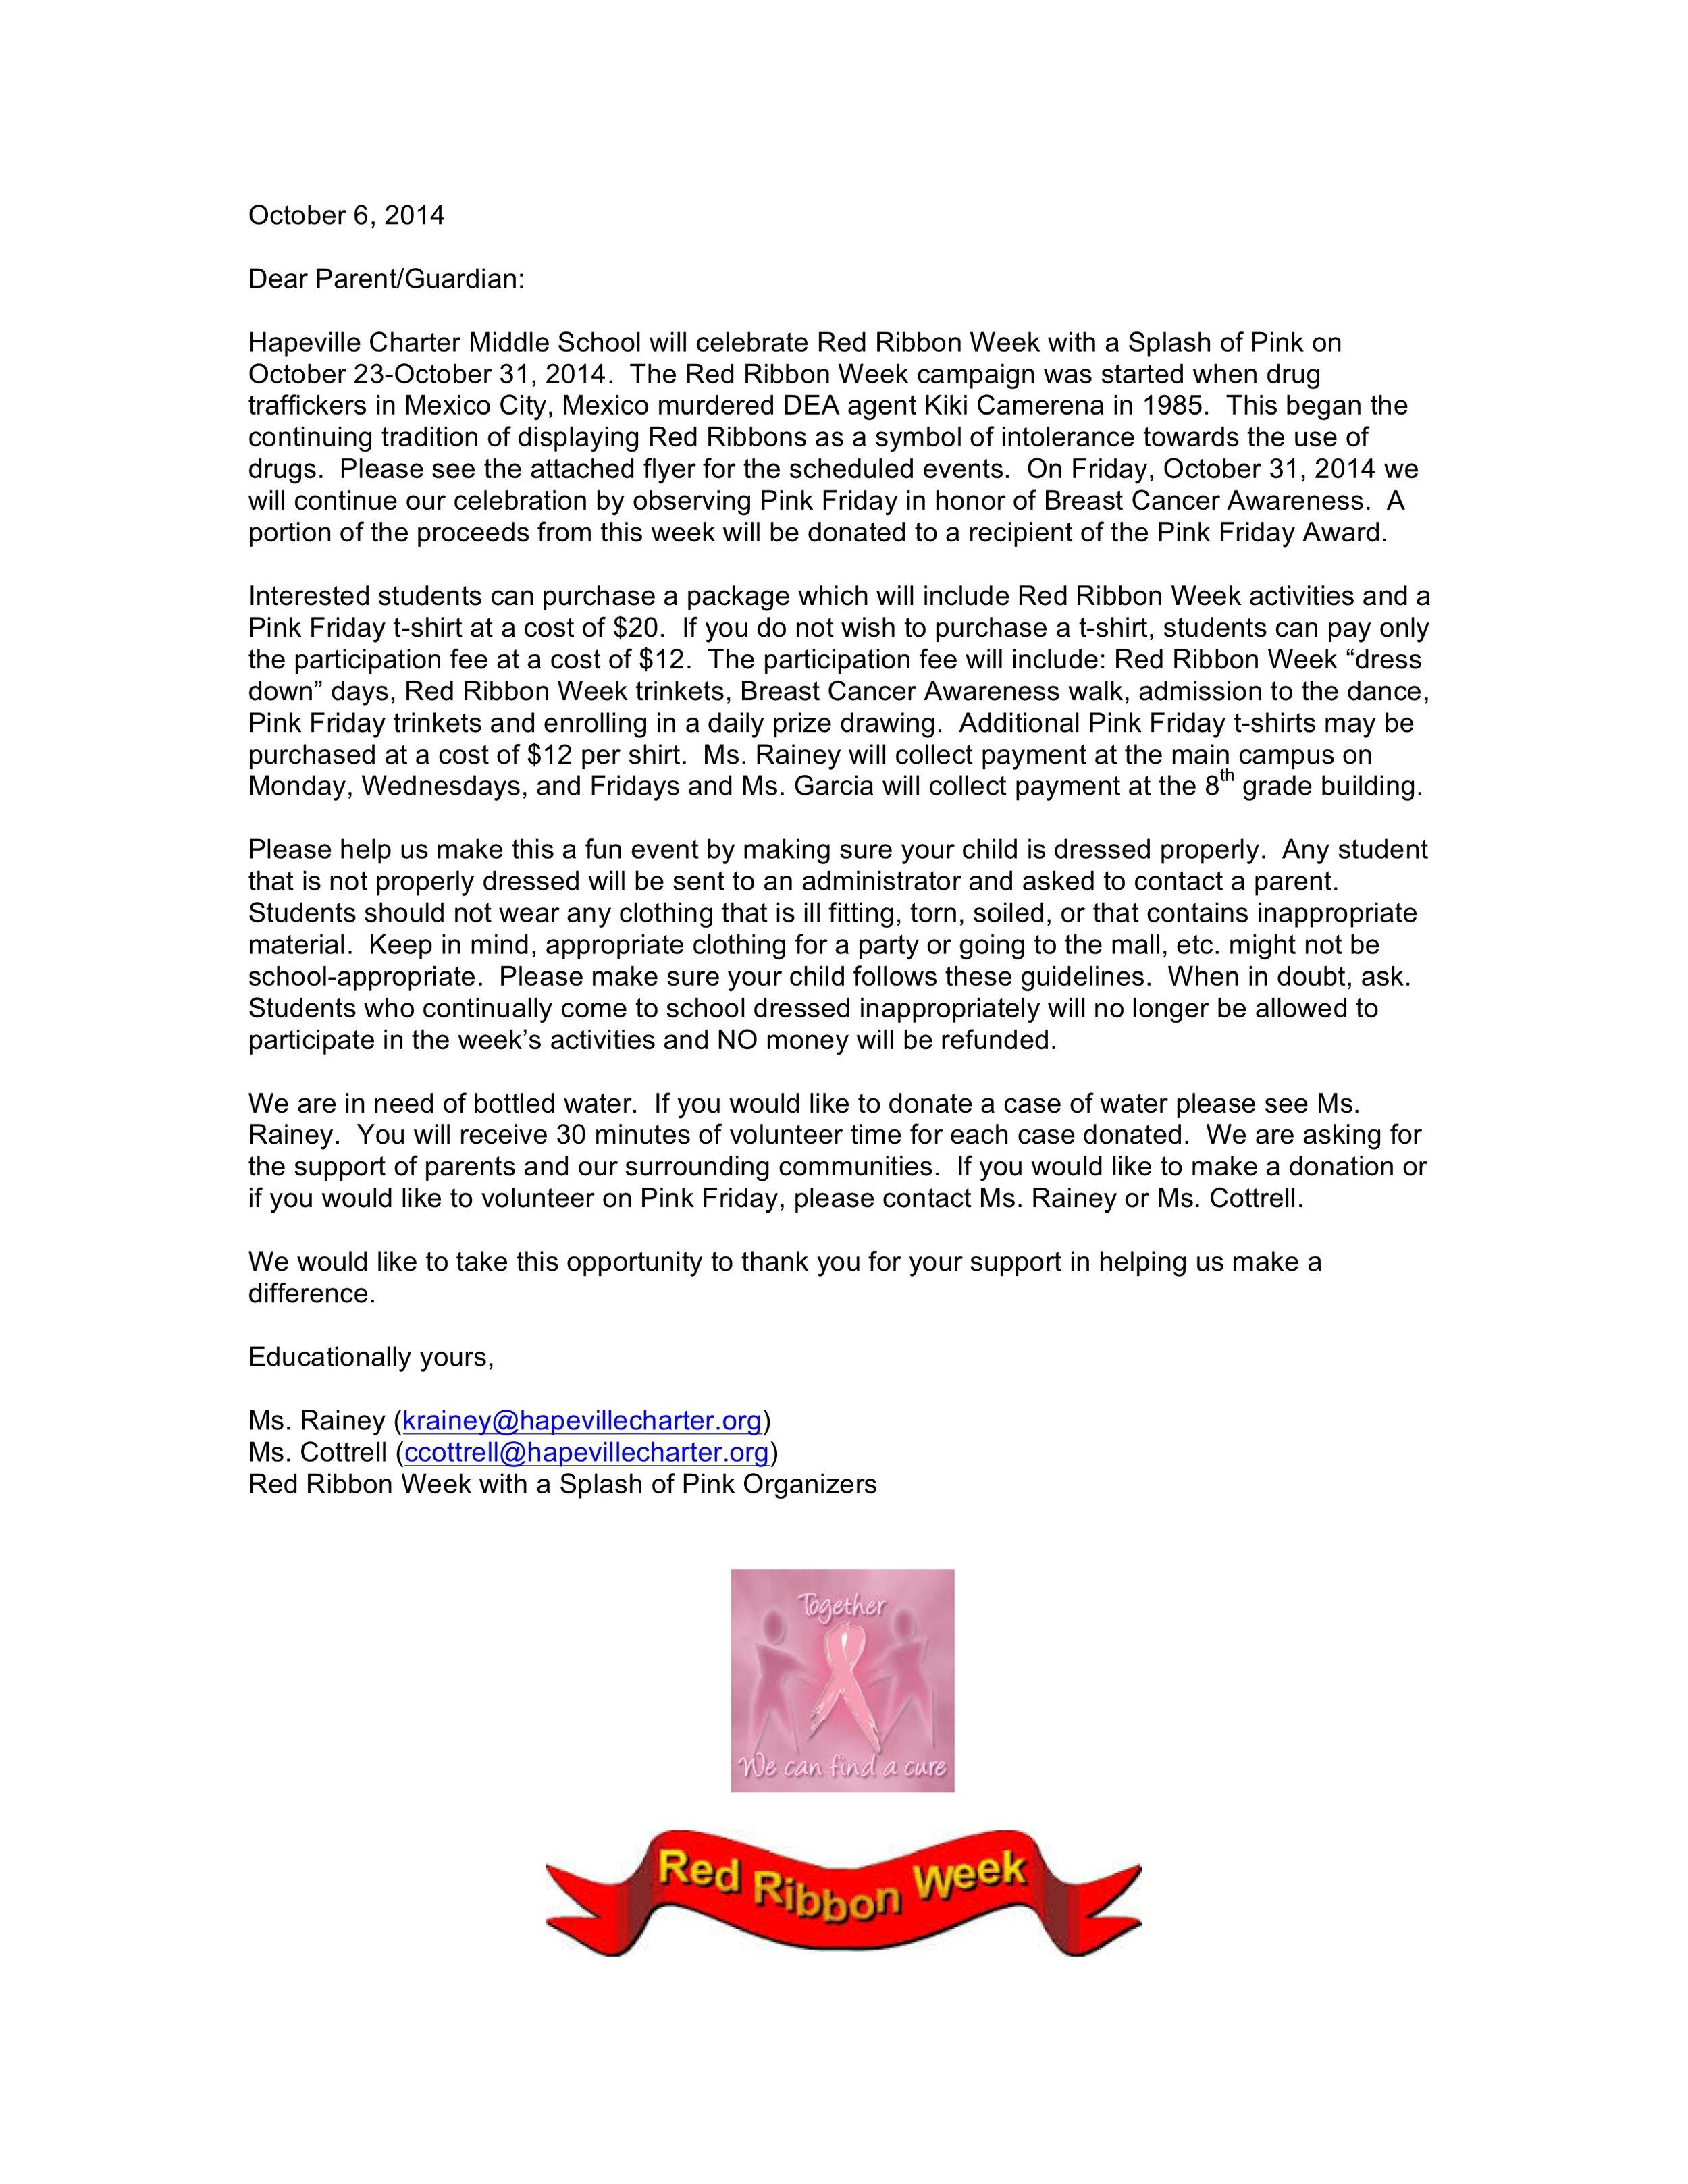 Newsletter Image6th grade October 6-10 5.jpeg